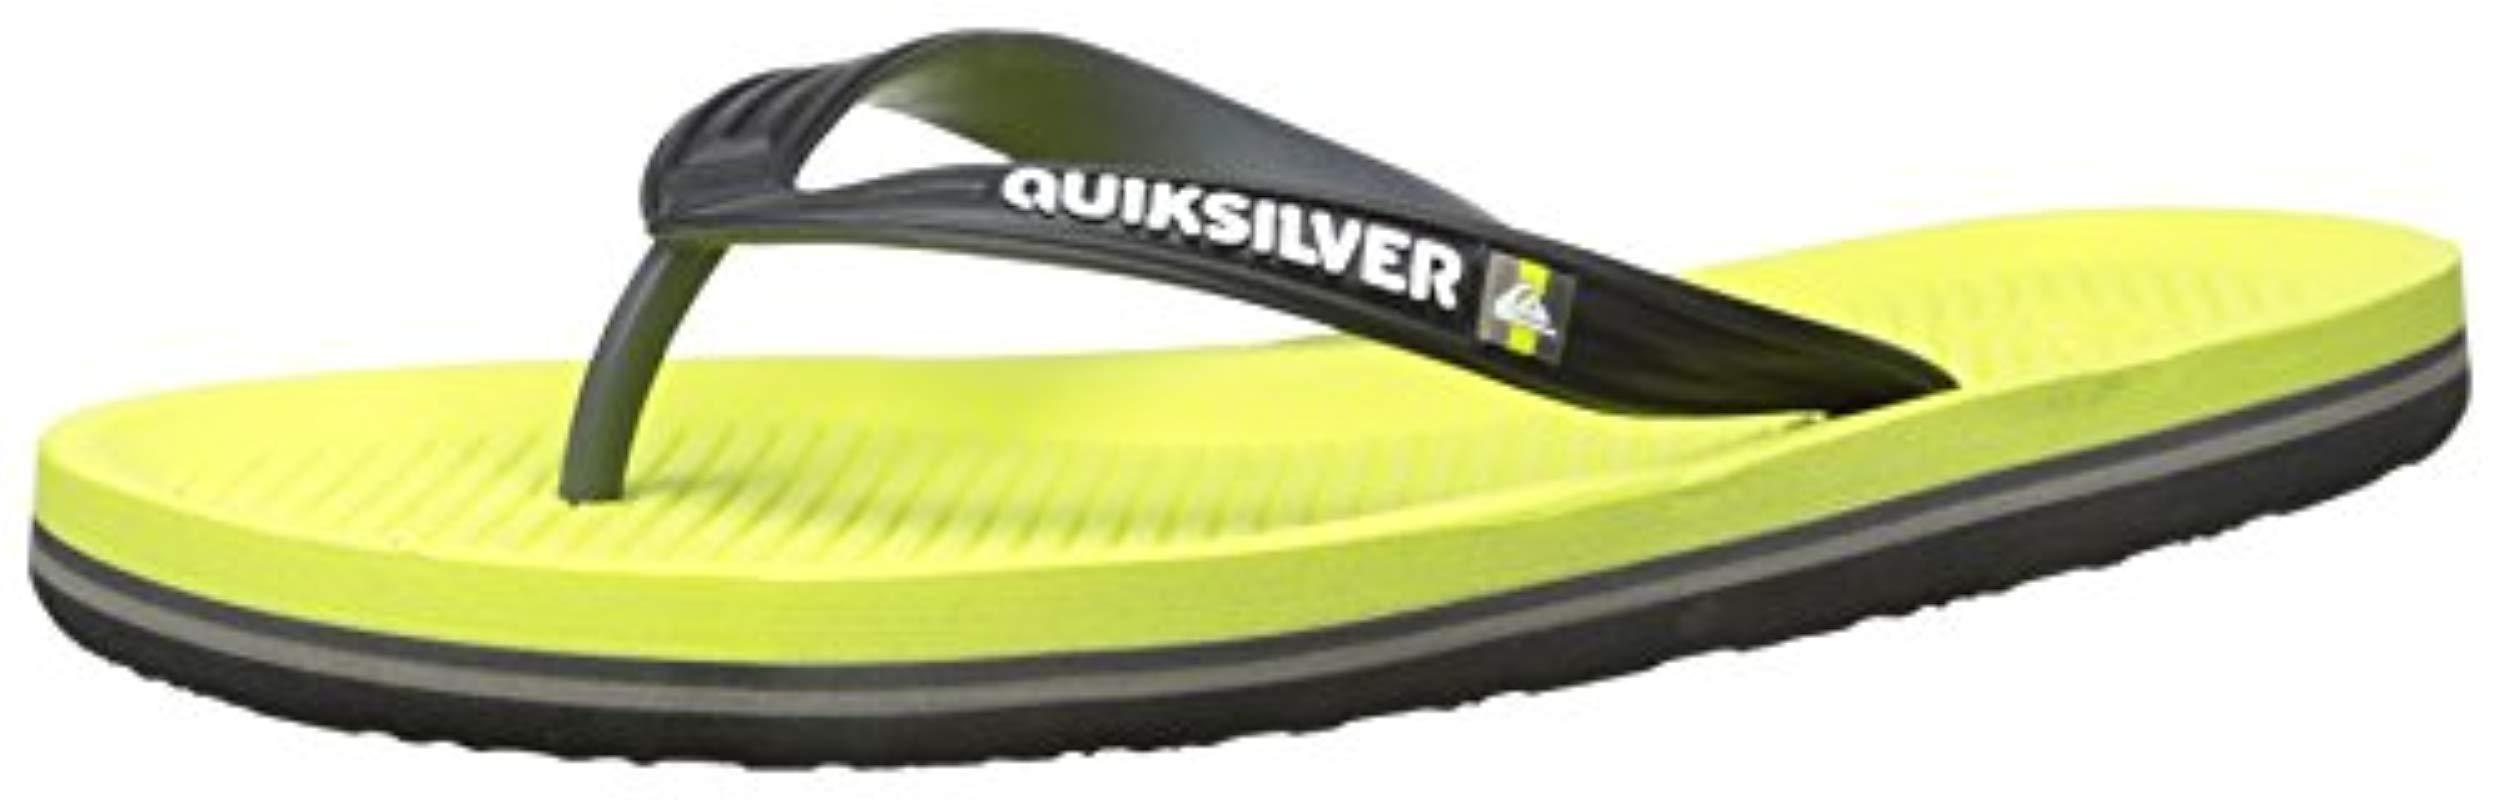 7af2202c1eb3 Quiksilver - Green Haleiwa Sandal-m for Men - Lyst. View fullscreen